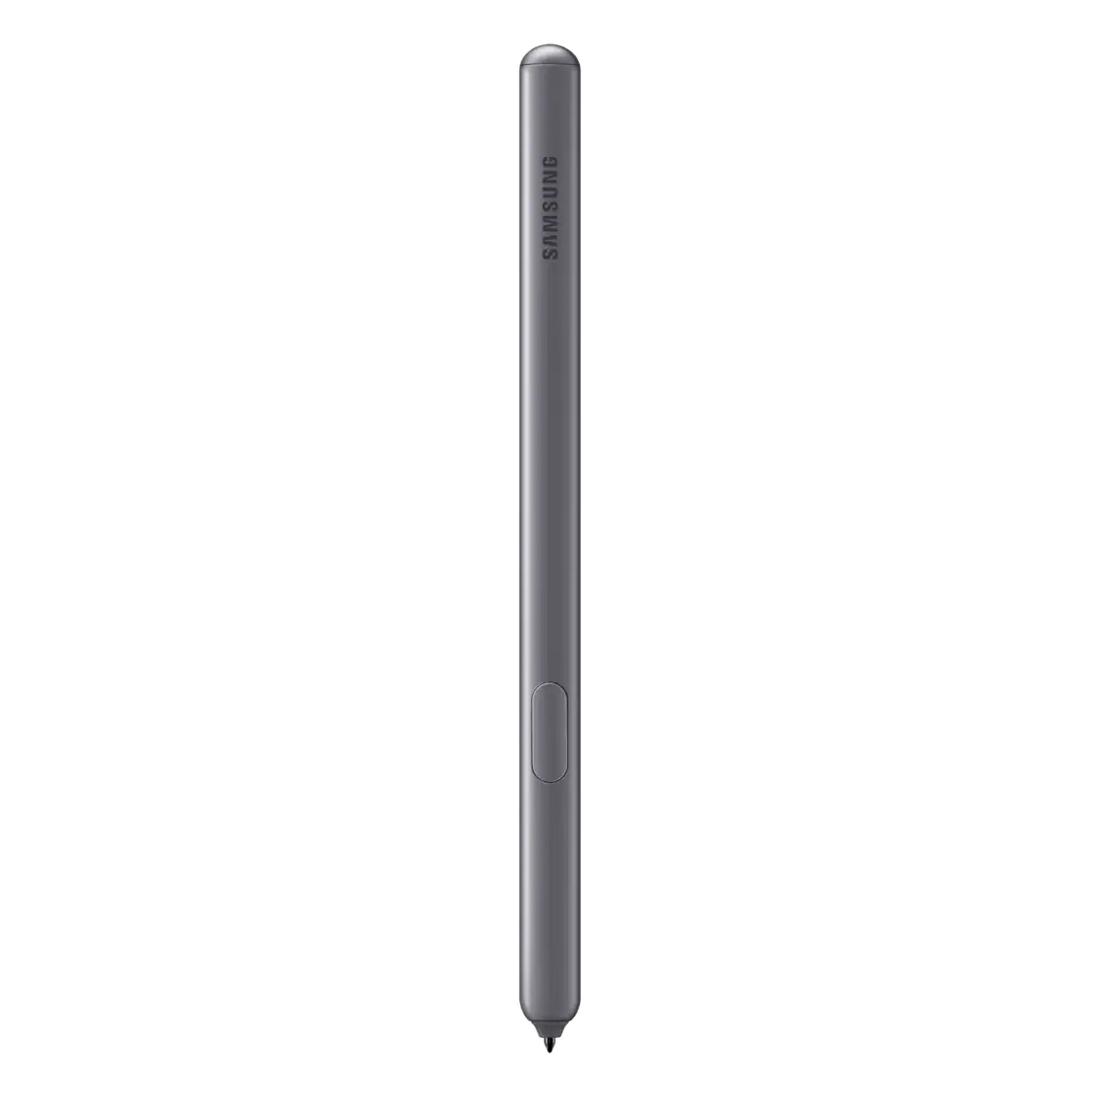 Samsung S-Pen For Galaxy Tab S6 - Grey